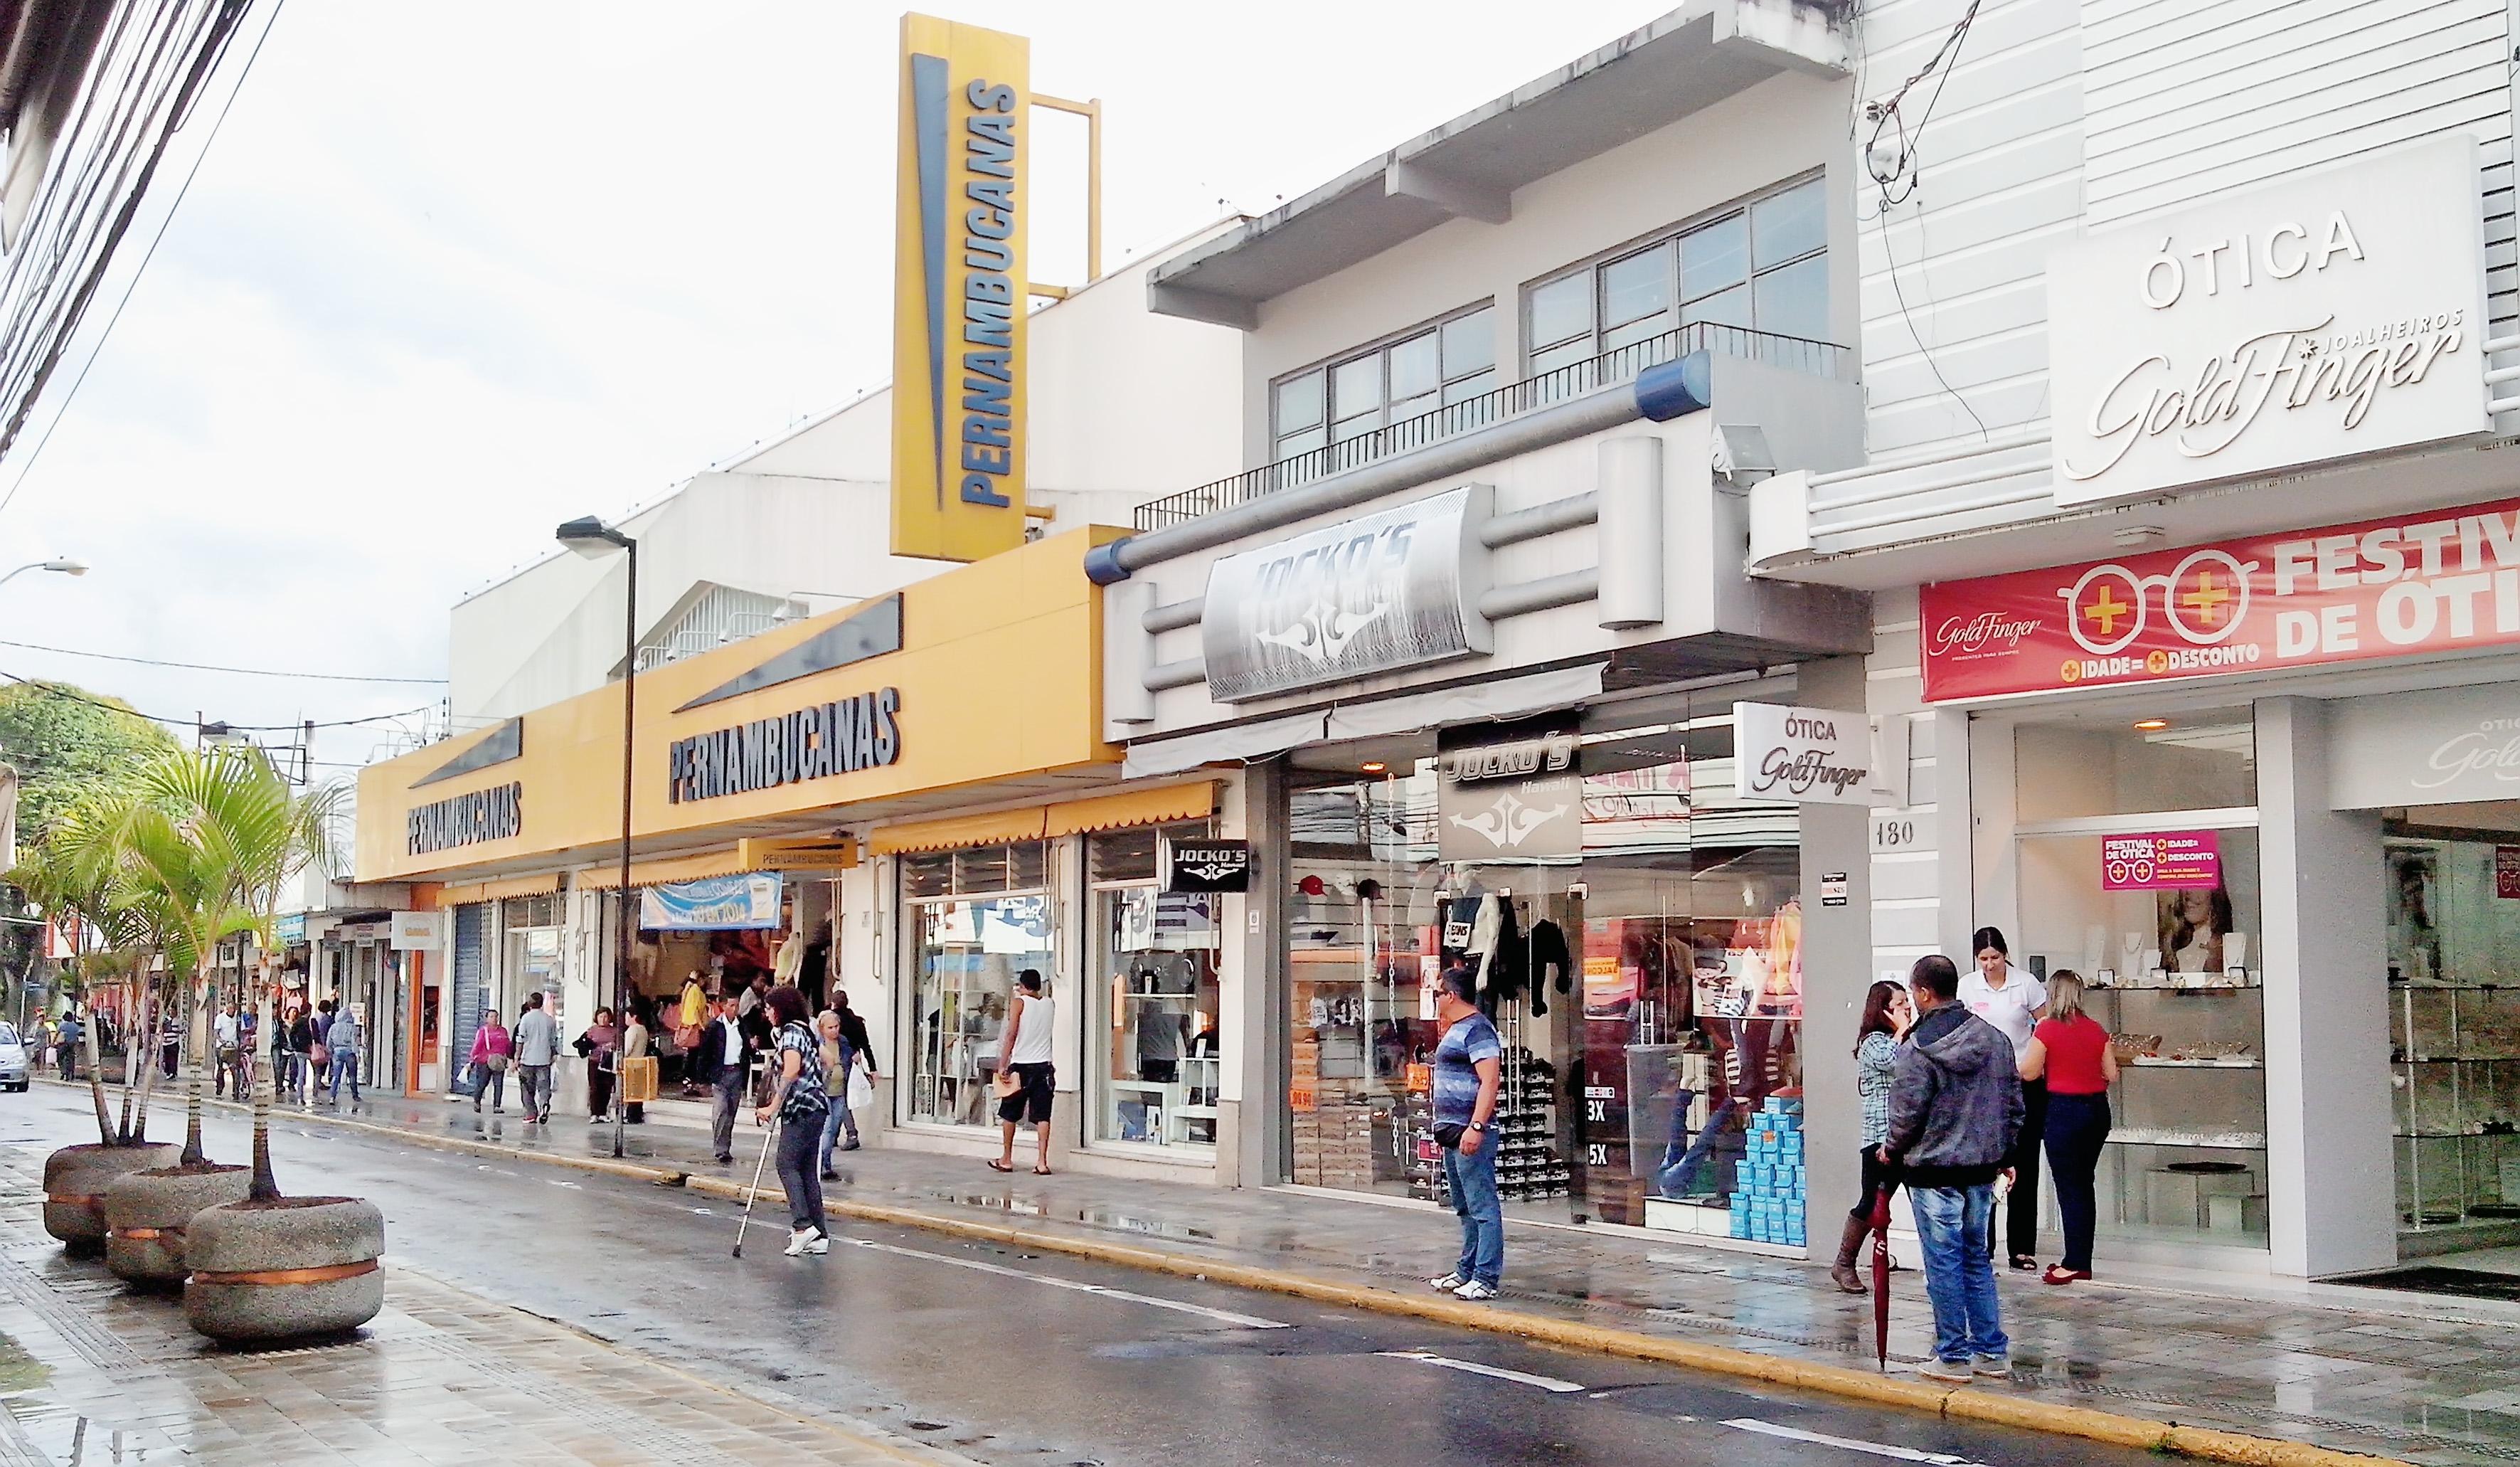 Centro comercial de Pindamonhangaba, por onde quadrilha fez vítimas entre estabelecimentos; Polícia Civil busca acusados por golpes (Foto: Arquivo Atos)